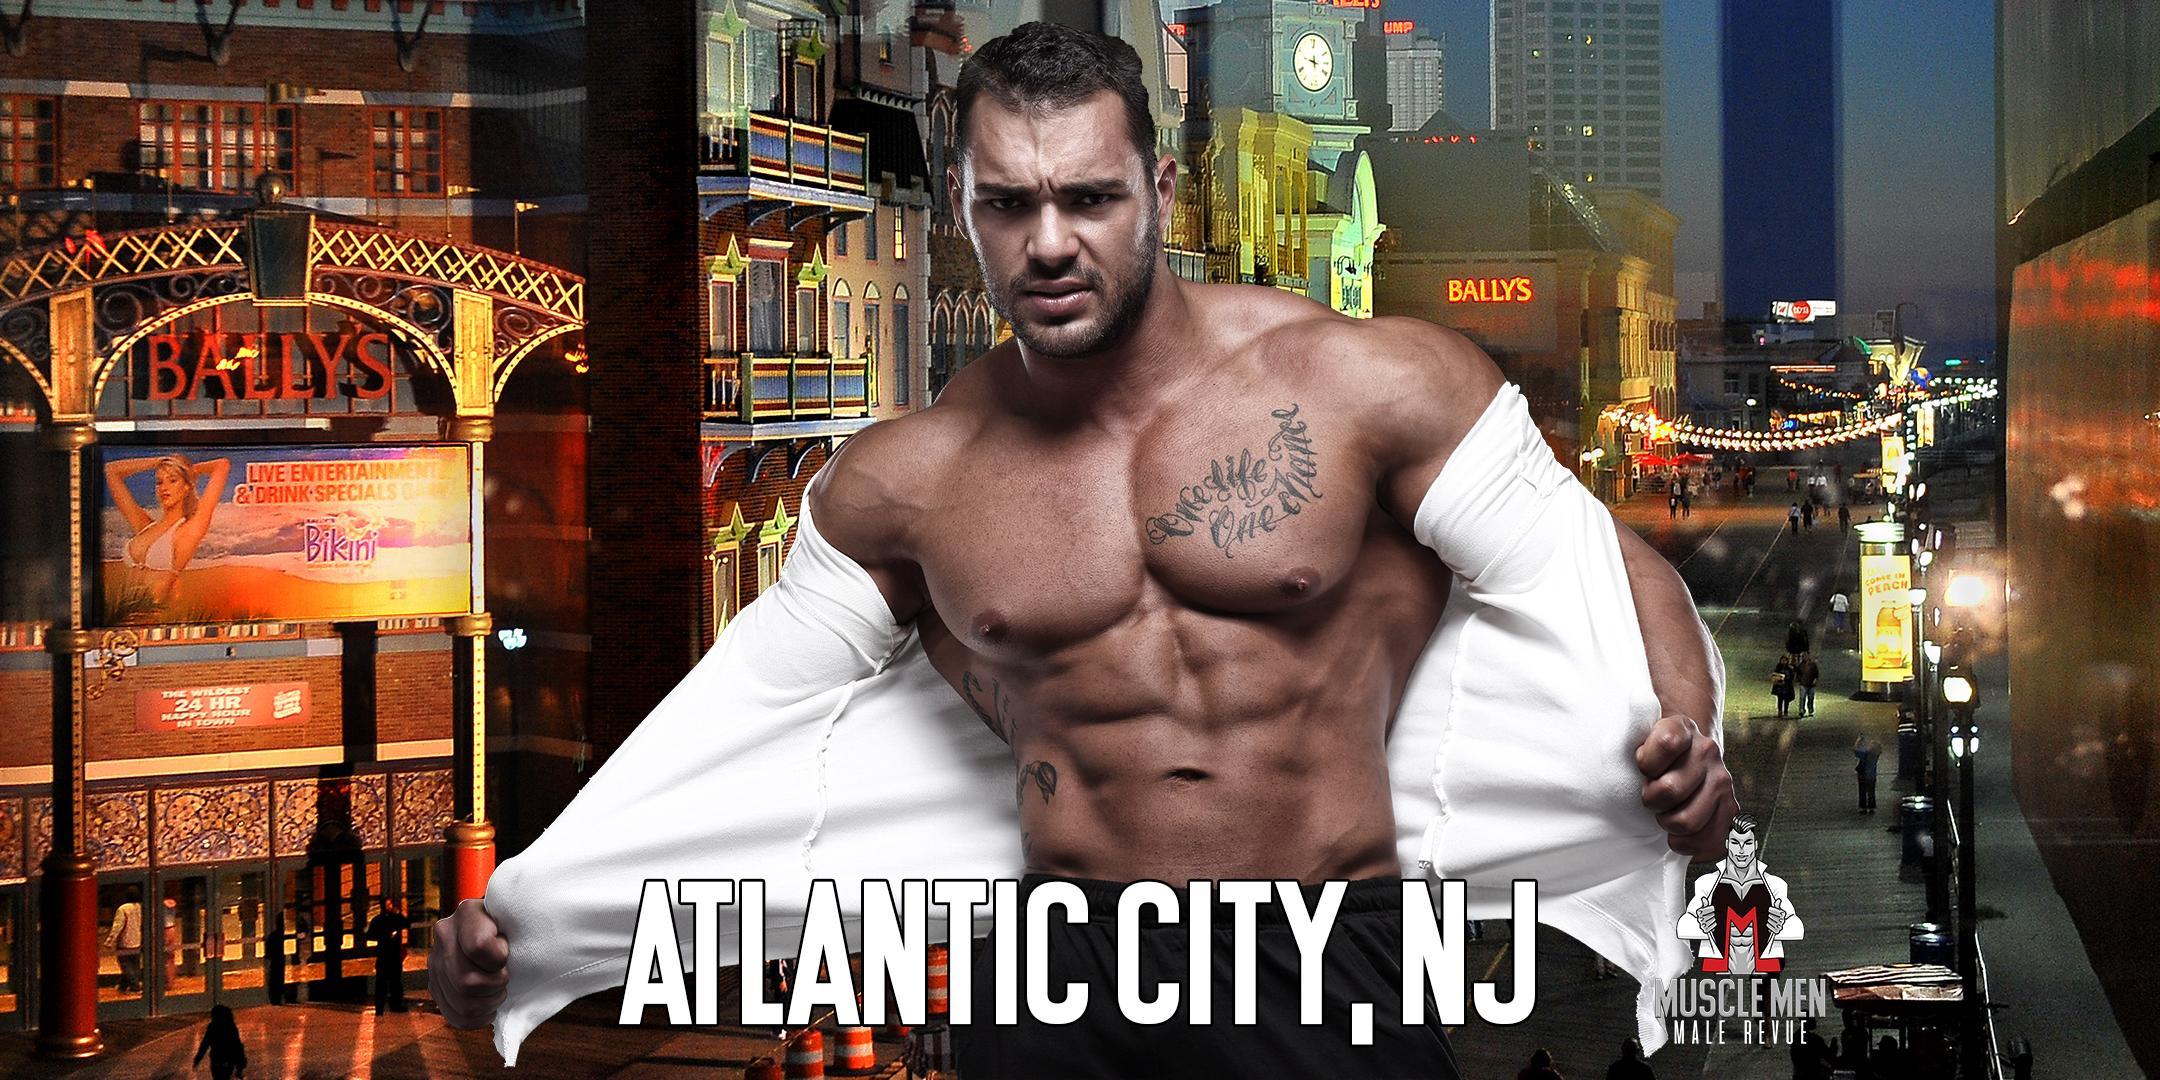 Muscle Men Male Strippers Revue & Male Strip Club Shows Atlantic City, NJ 8PM-10PM